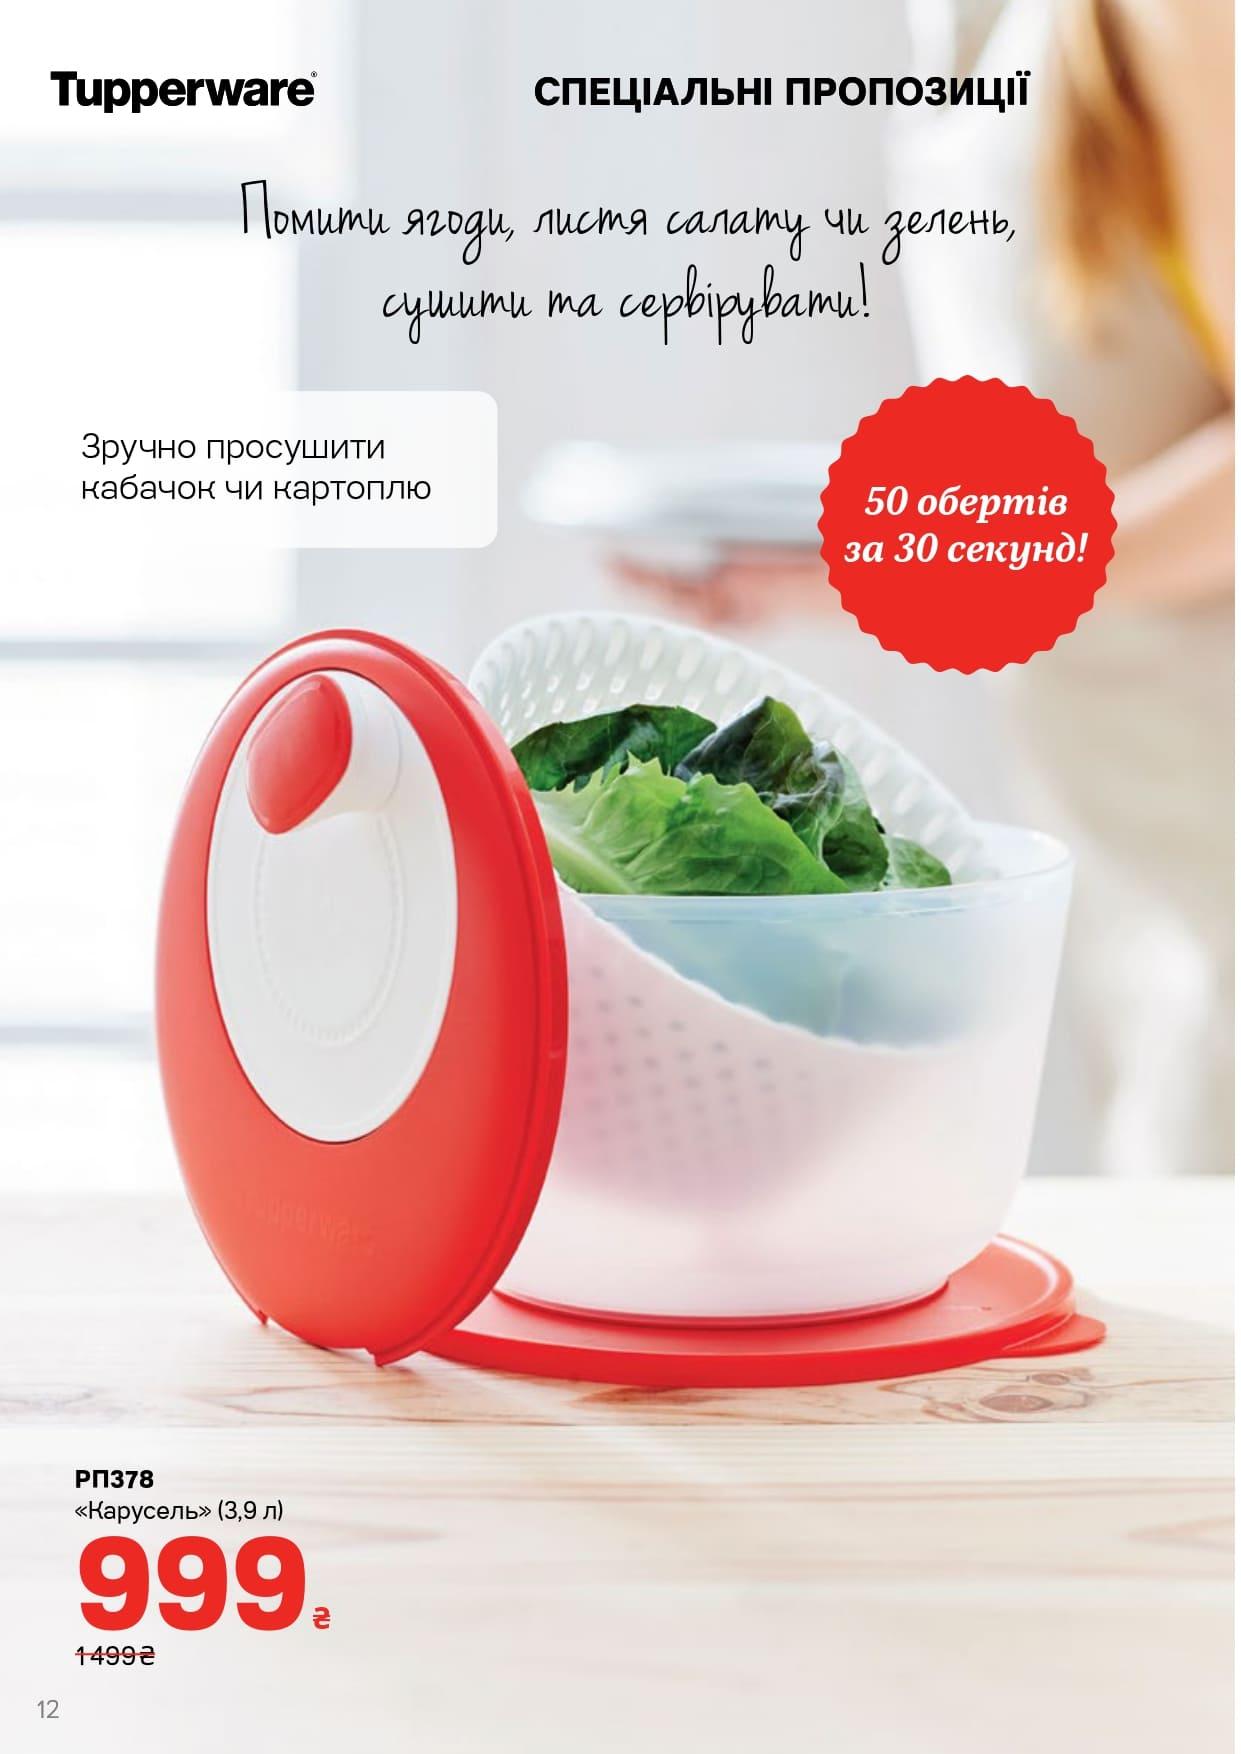 Tupperware предлагает скидку 33% на карусель для зелени, цена снижена на 500 грн.